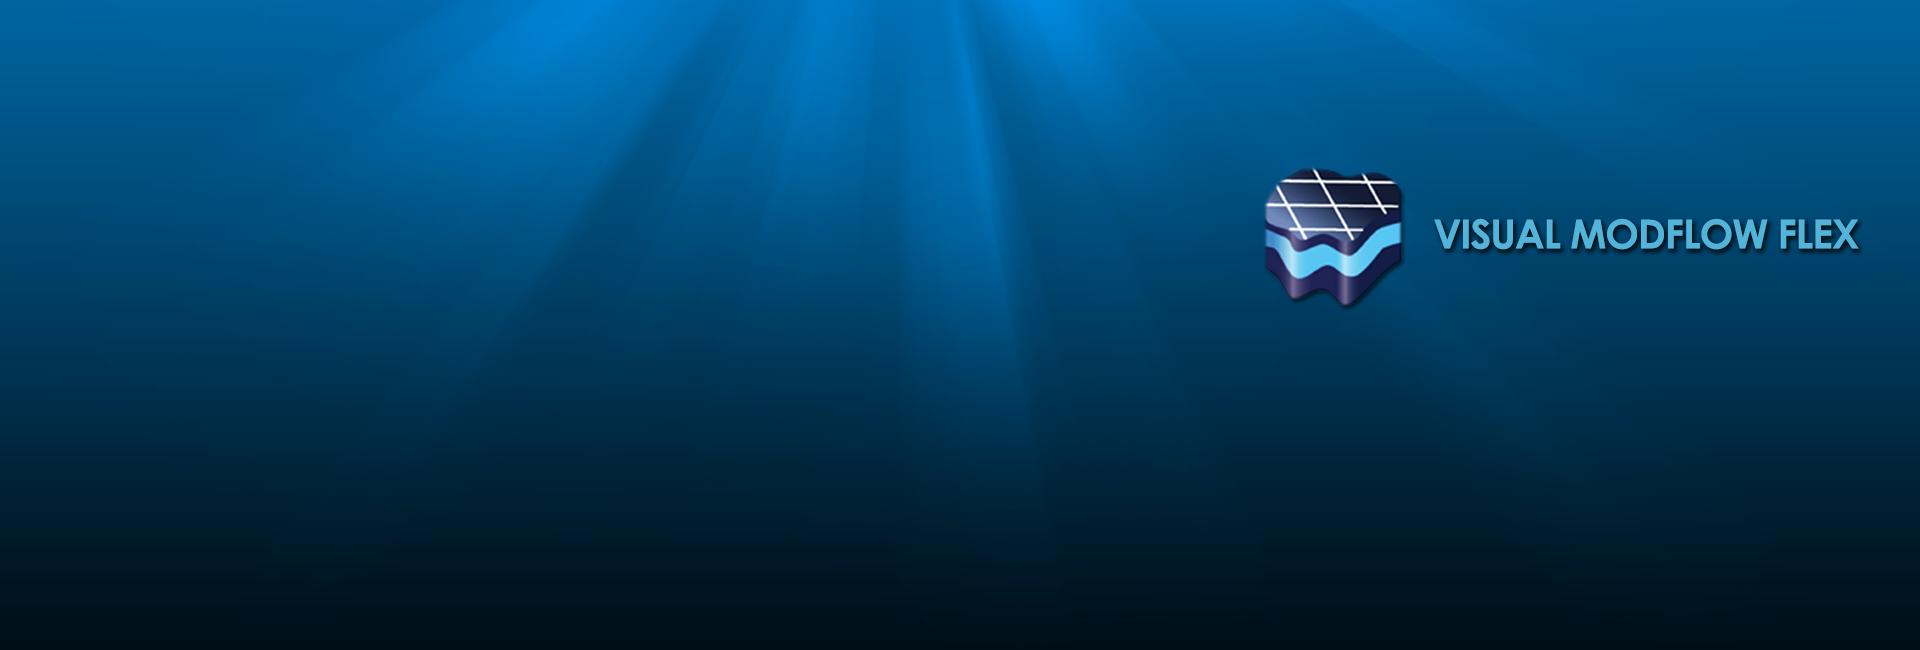 Nowa wersja Visual MODFLOW Flex